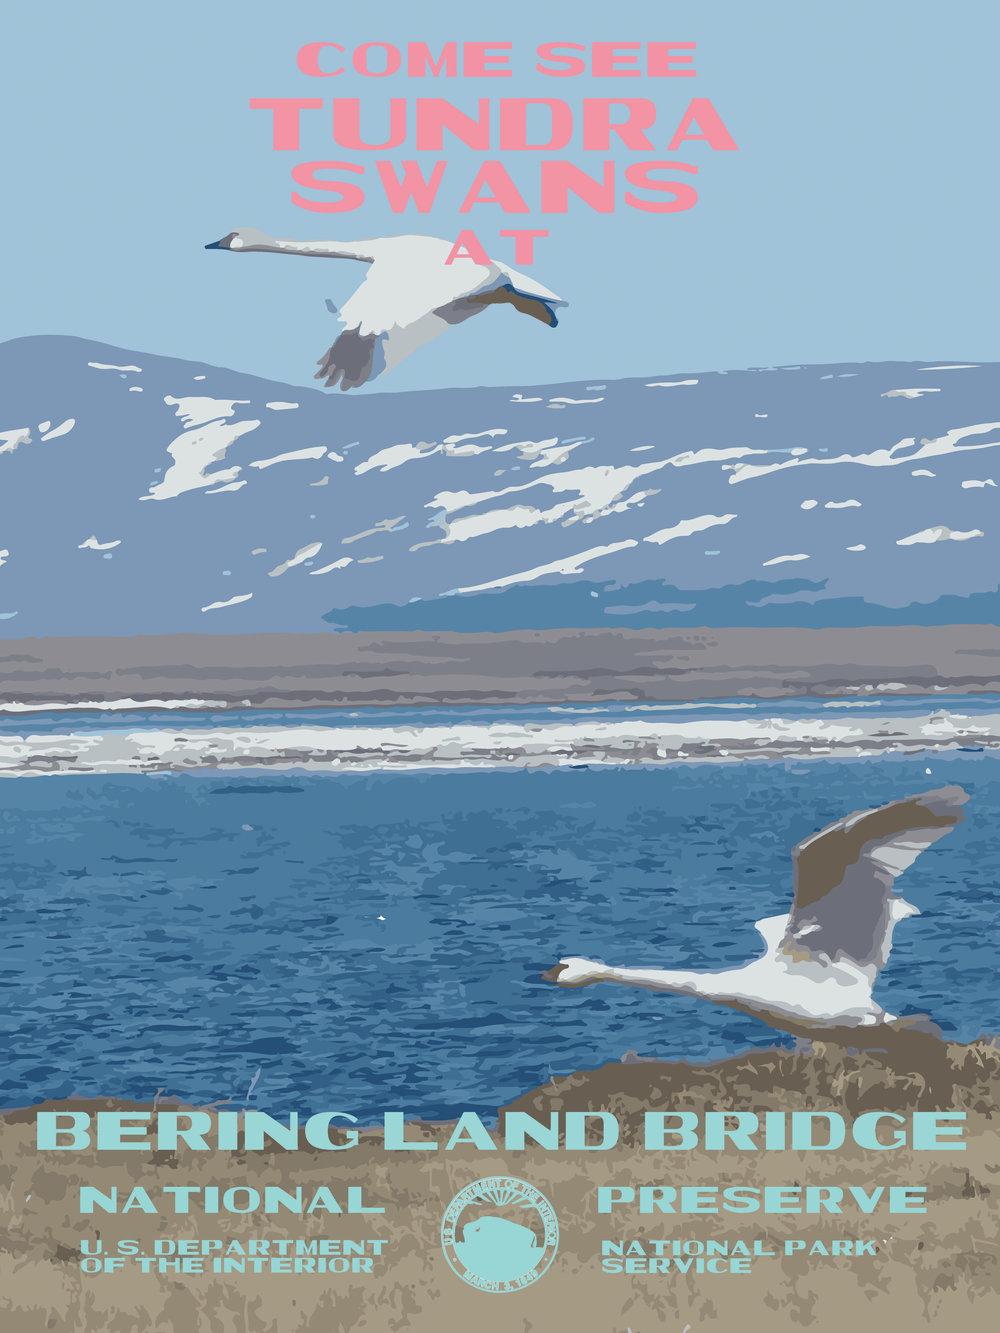 BERING LAND BRIDGE MEDIA